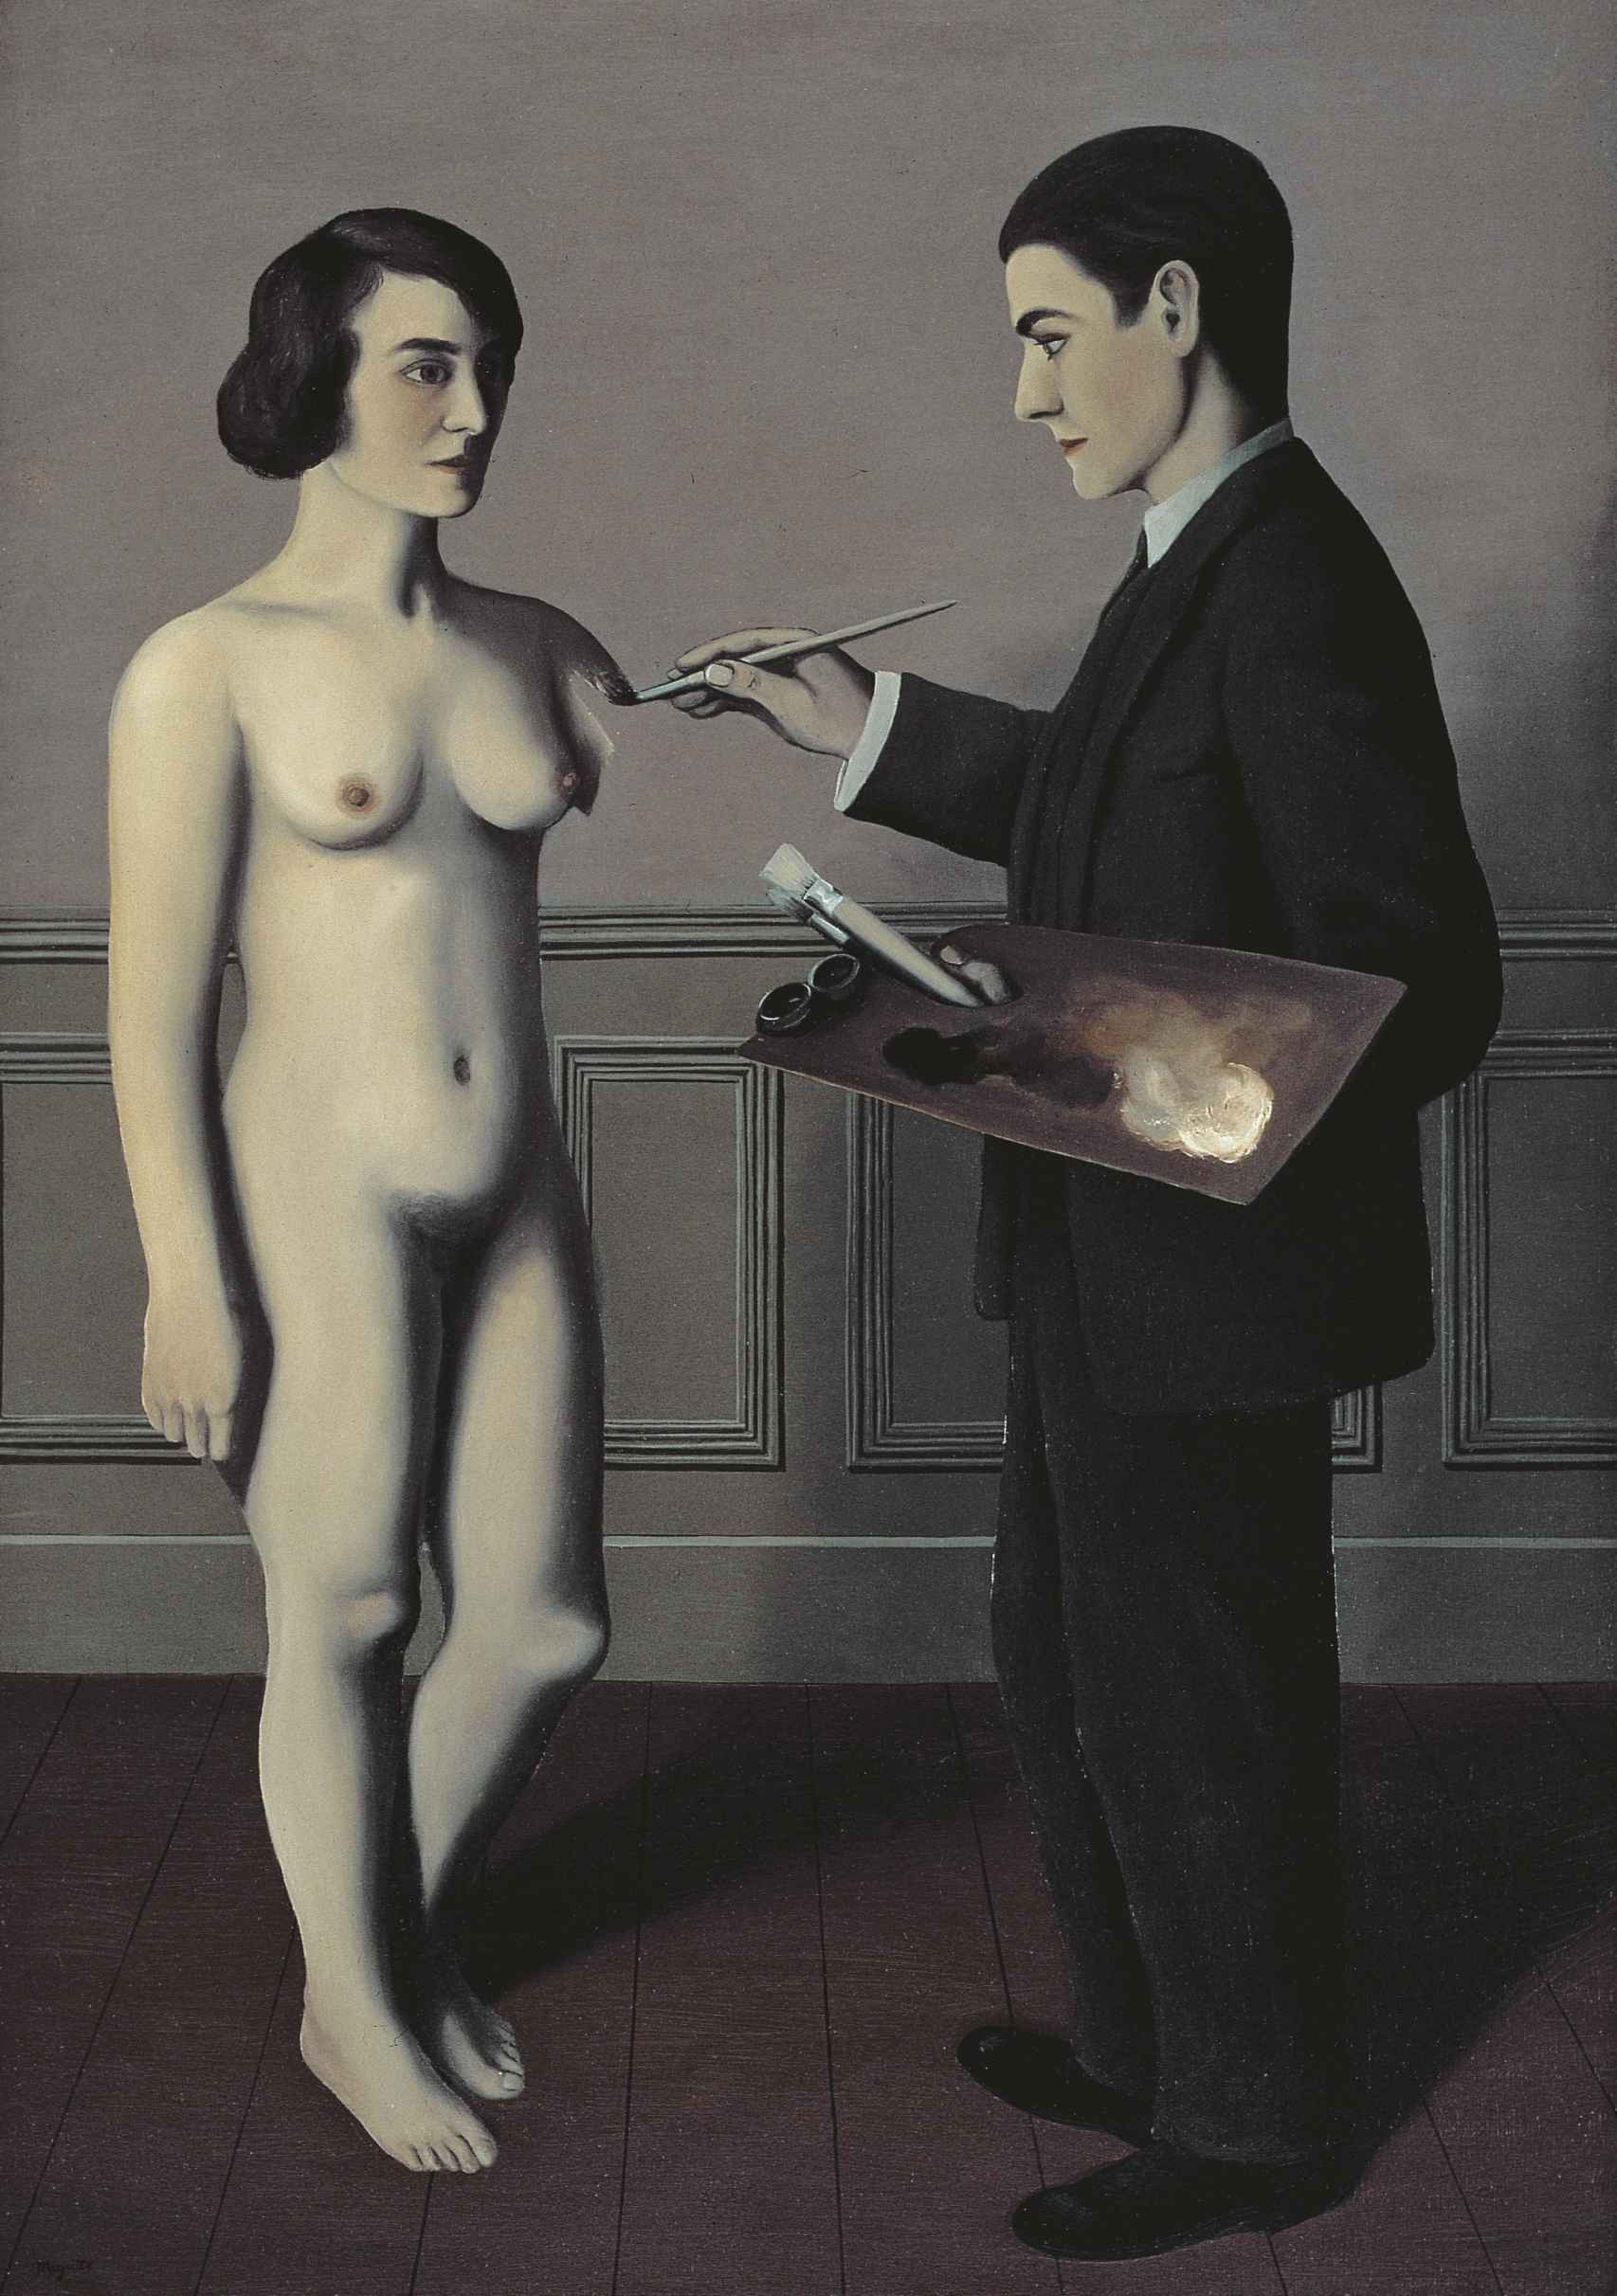 'Tentativa de lo imposible', de René Magritte.